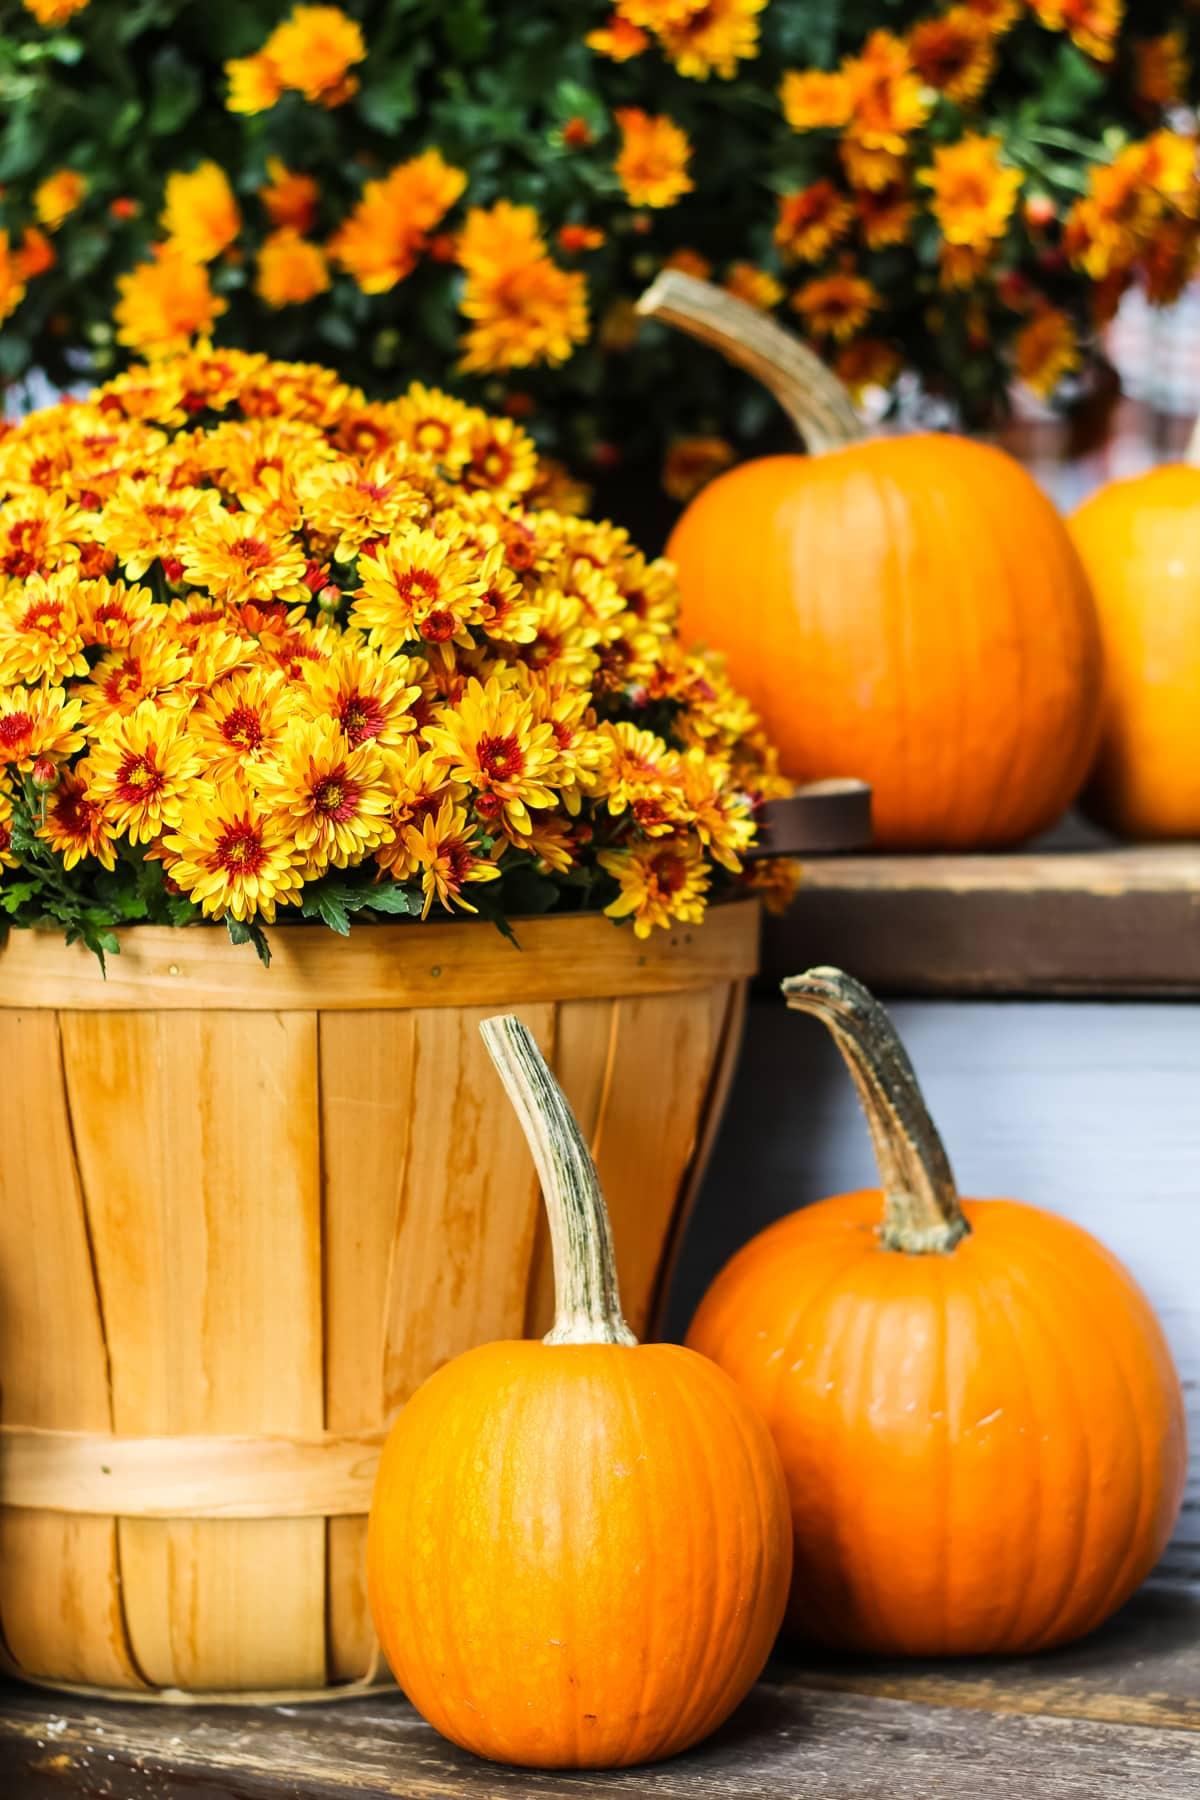 a close up of three mini orange pumpkins amongst gold mums in apple baskets